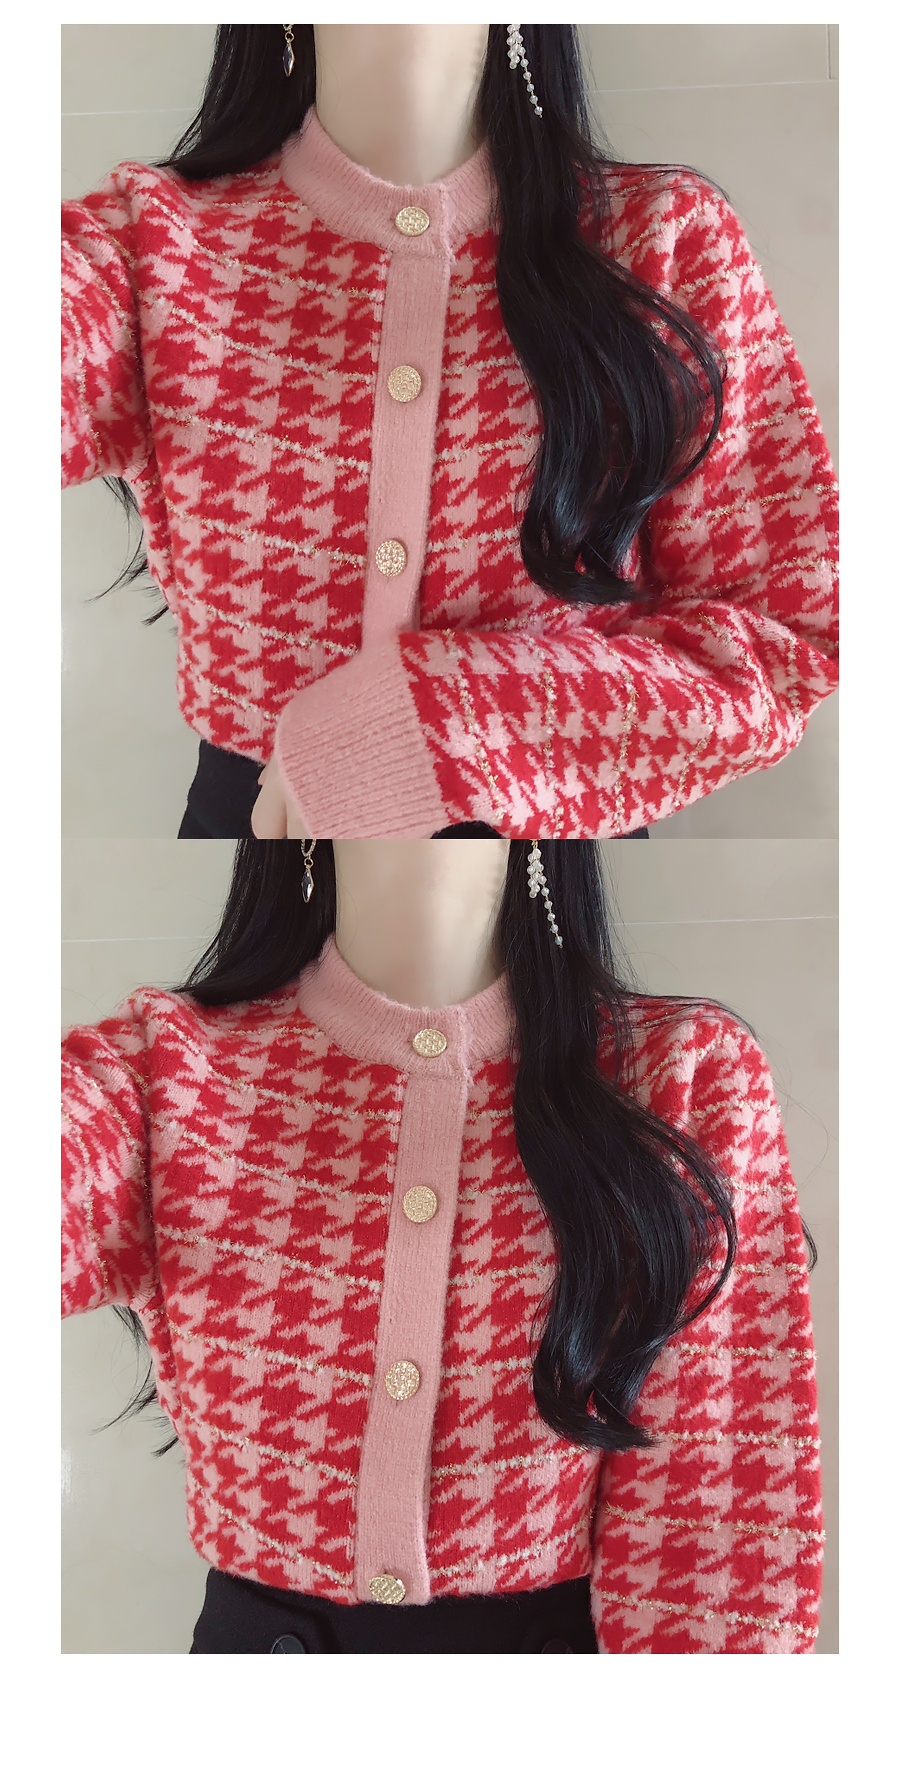 Olivier Hound knit cardigan